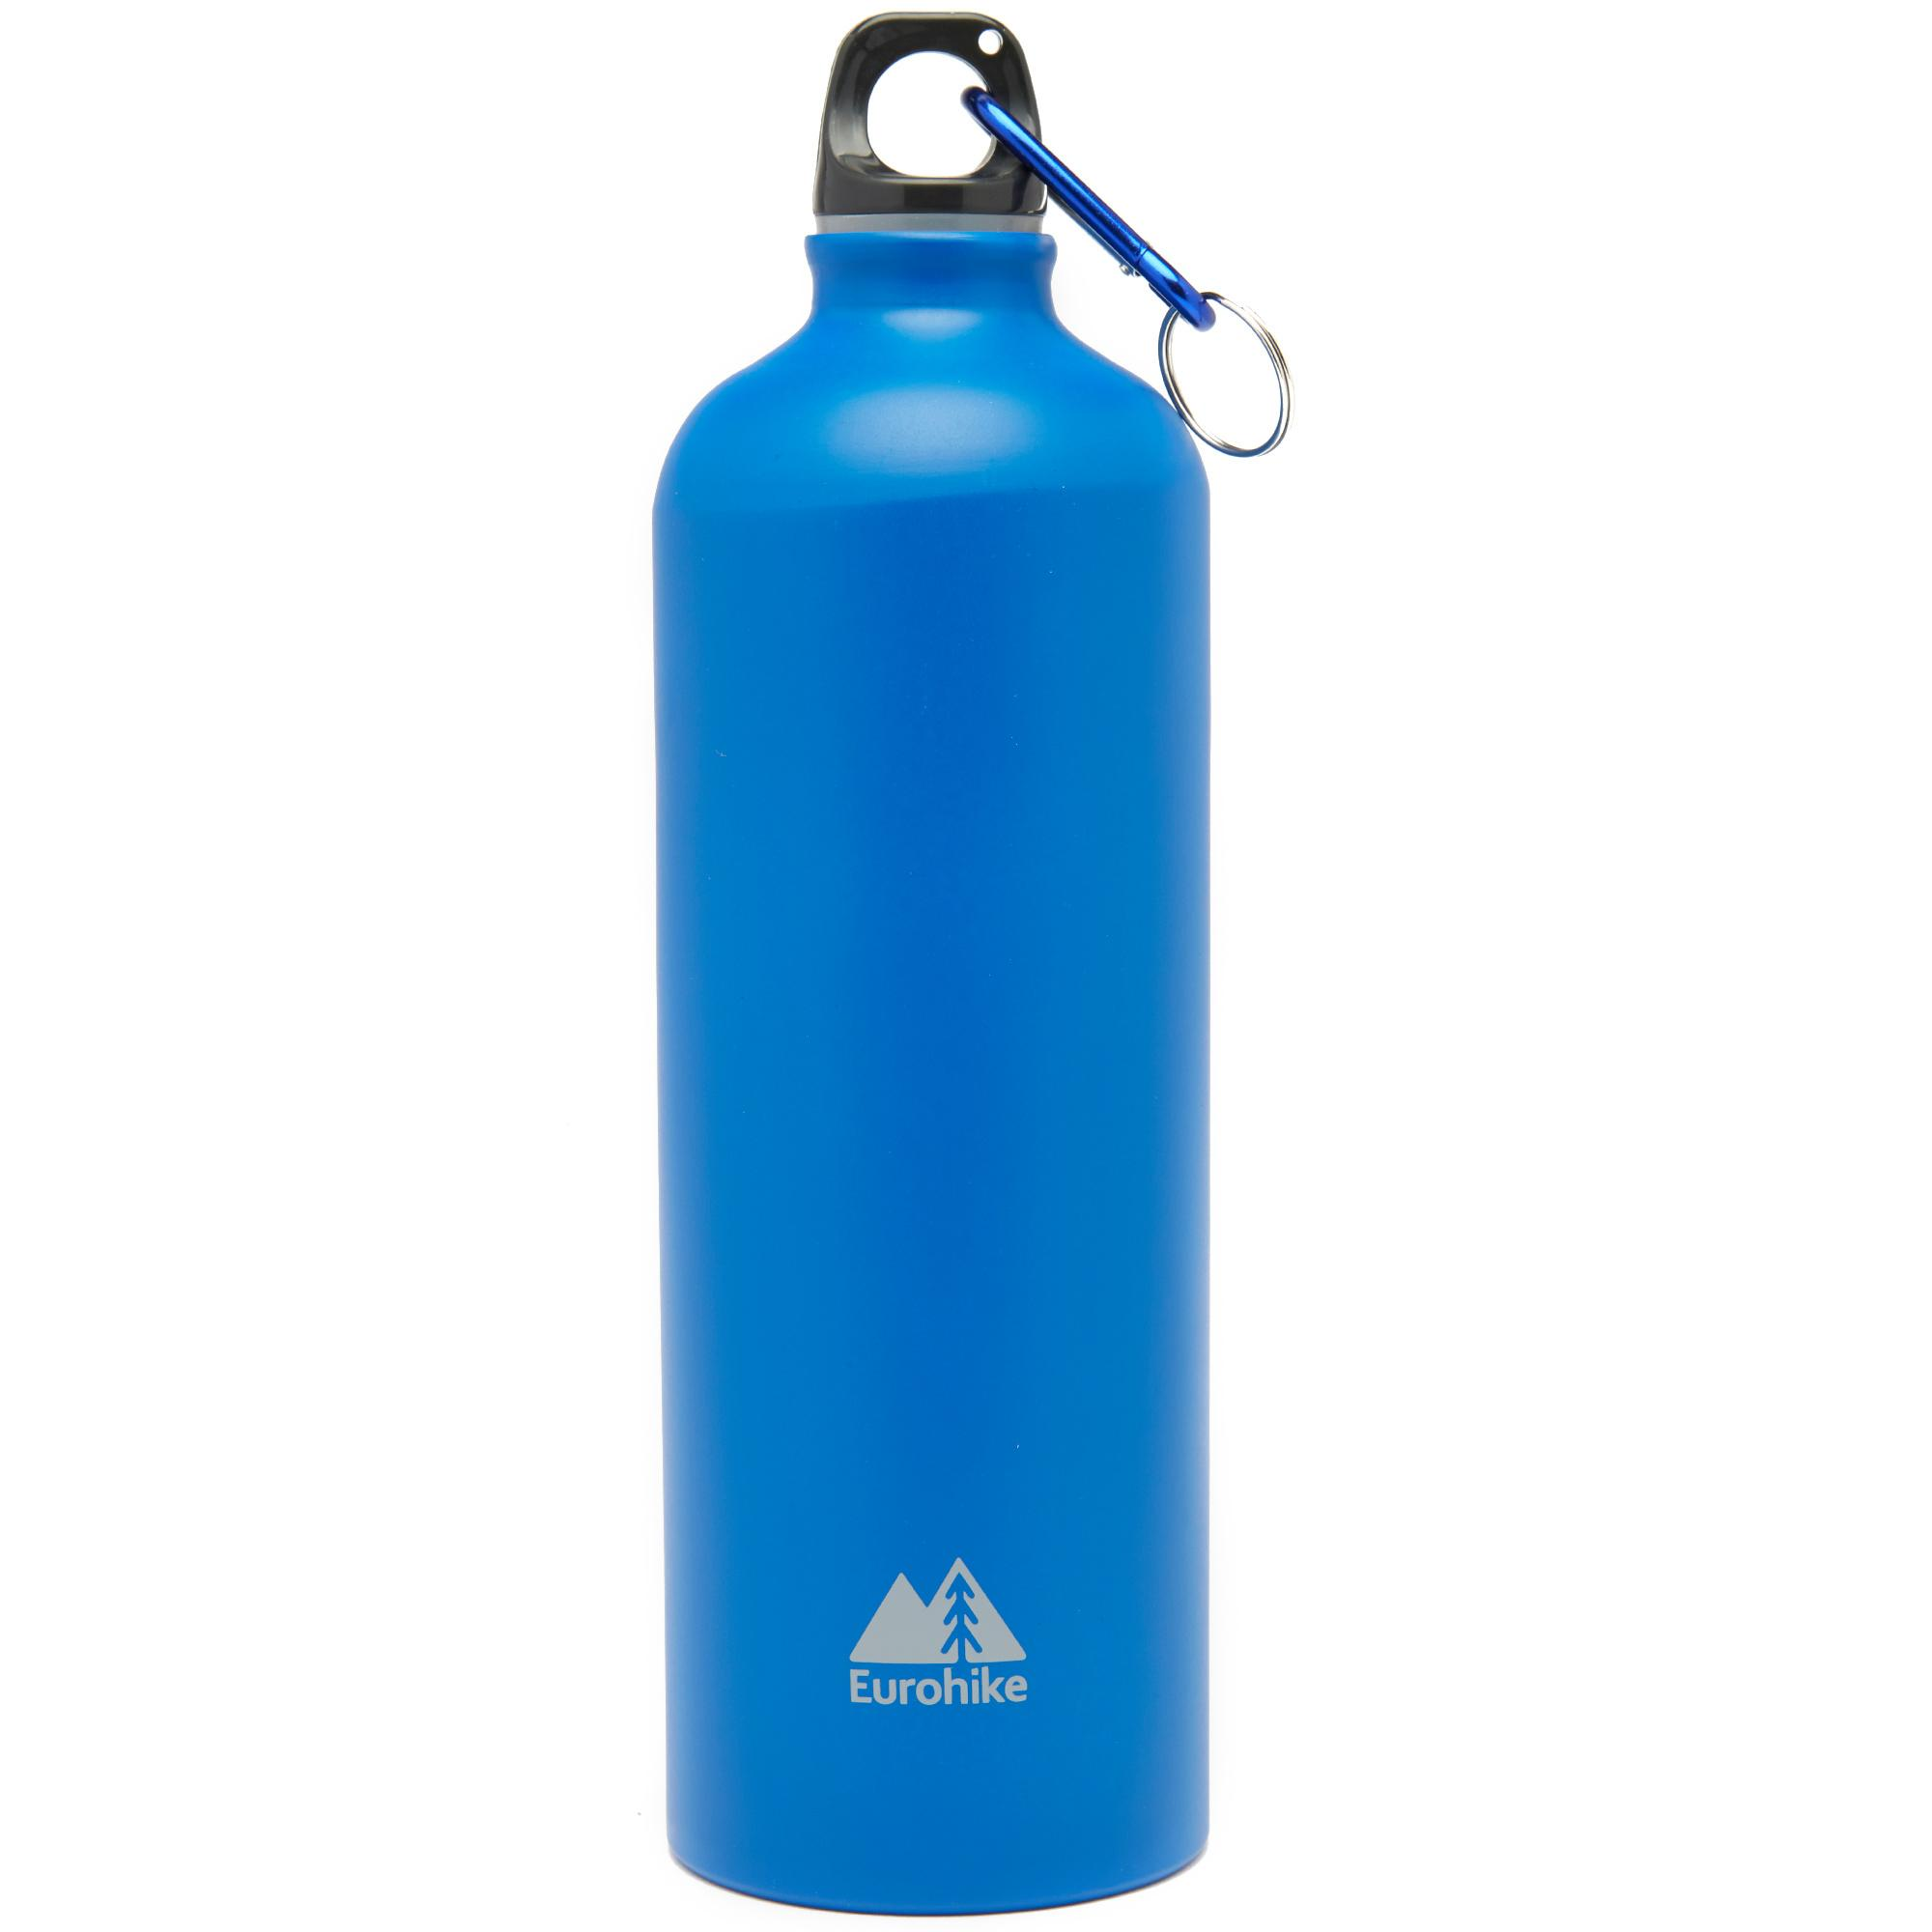 Eurohike Aqua 1L Aluminium Bottle, Blue/BLUE